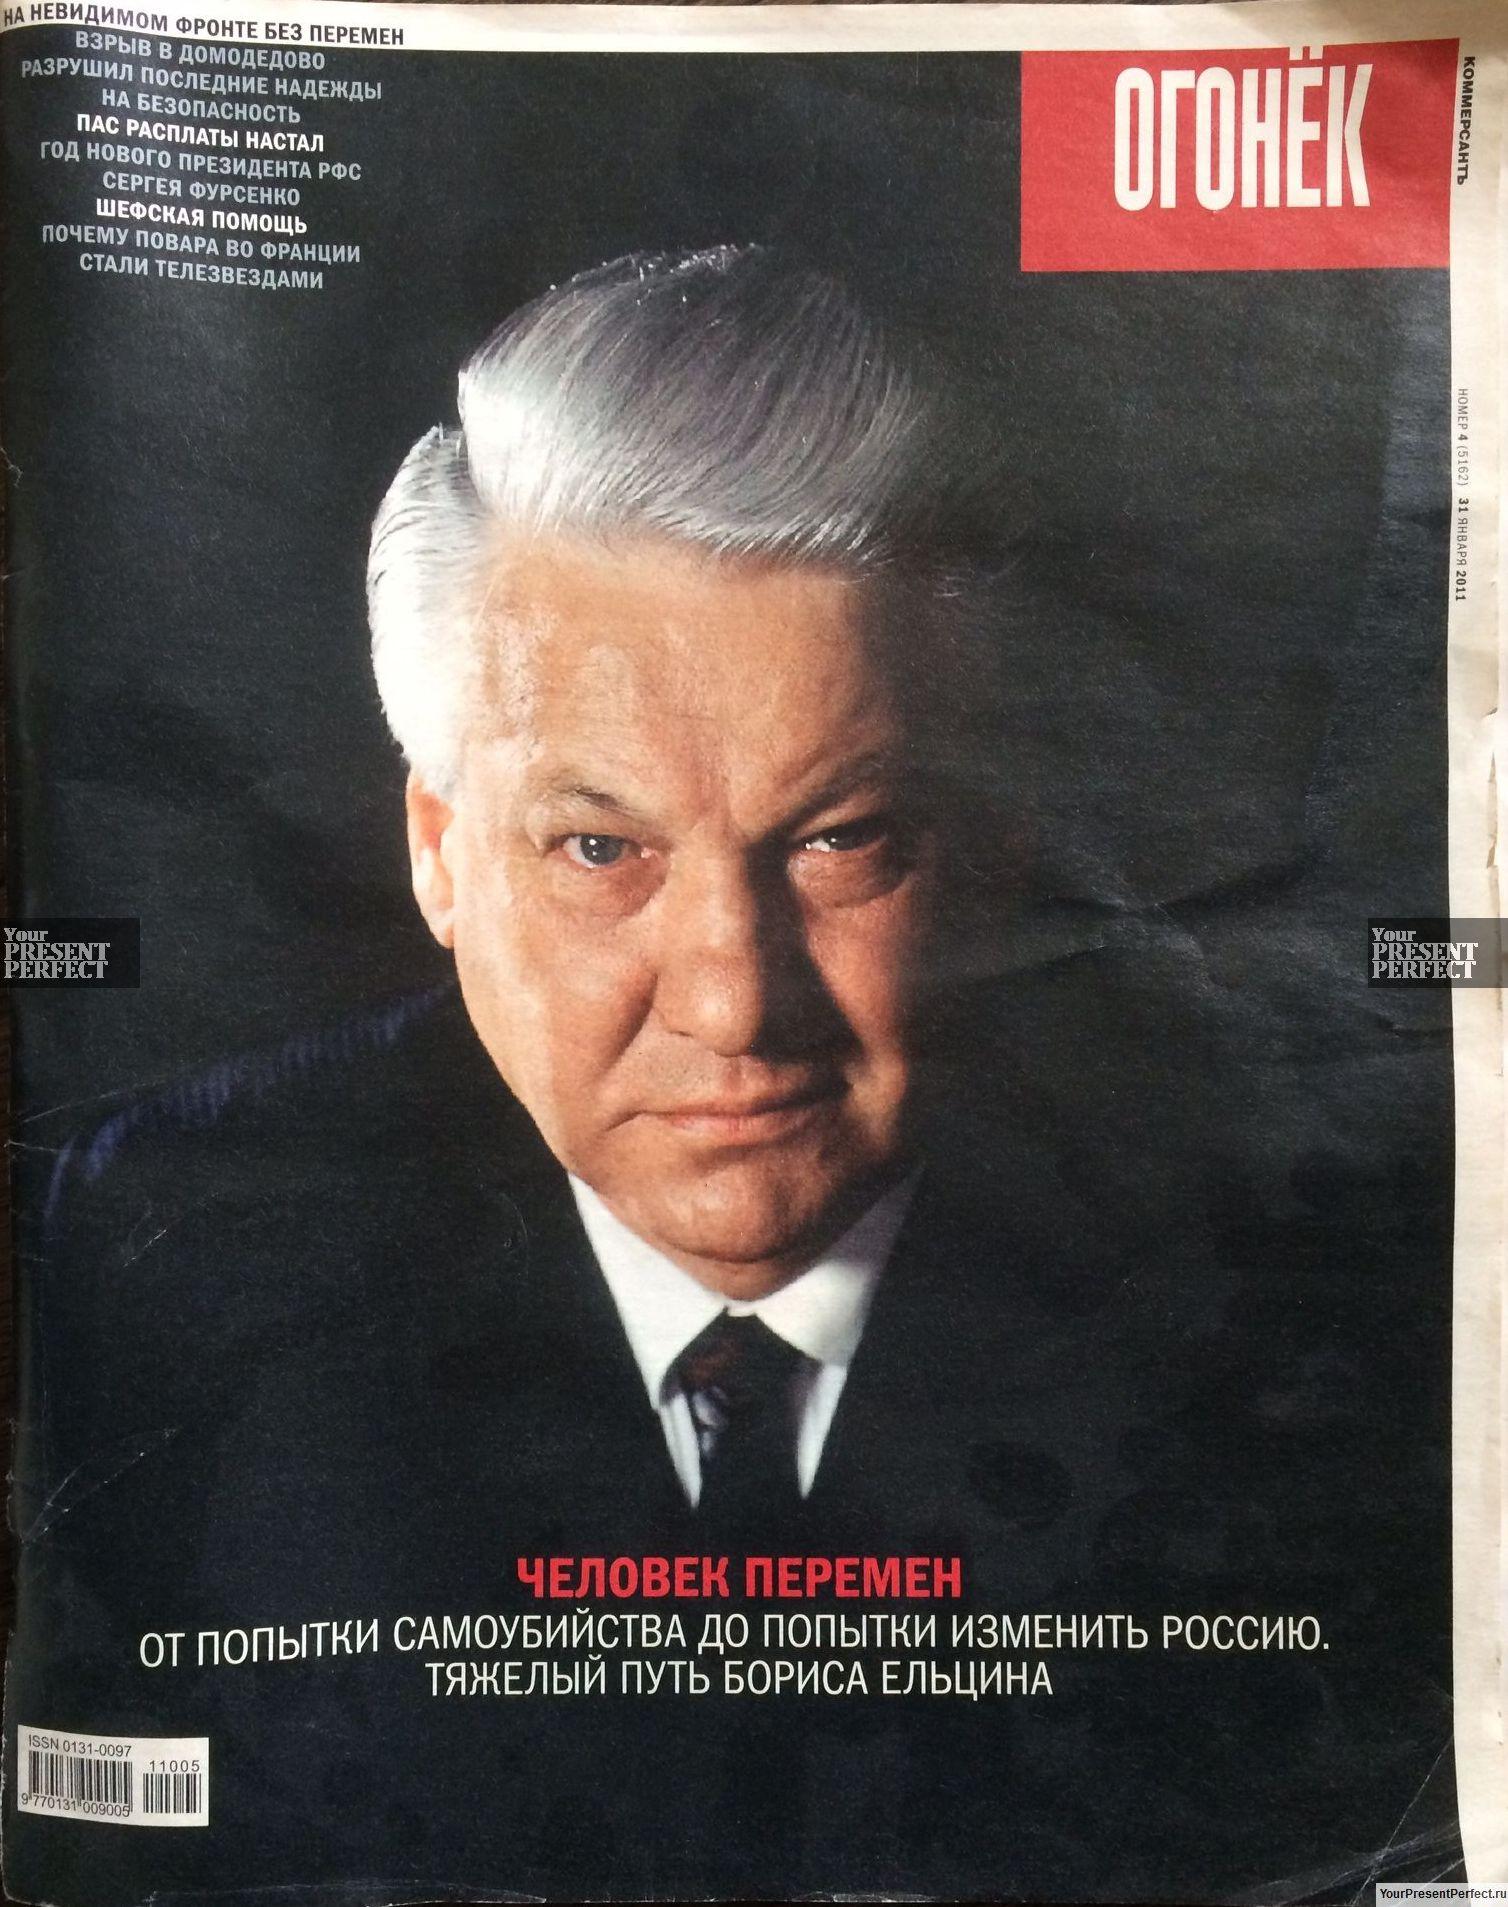 Журнал Огонек №4 31 января 2011